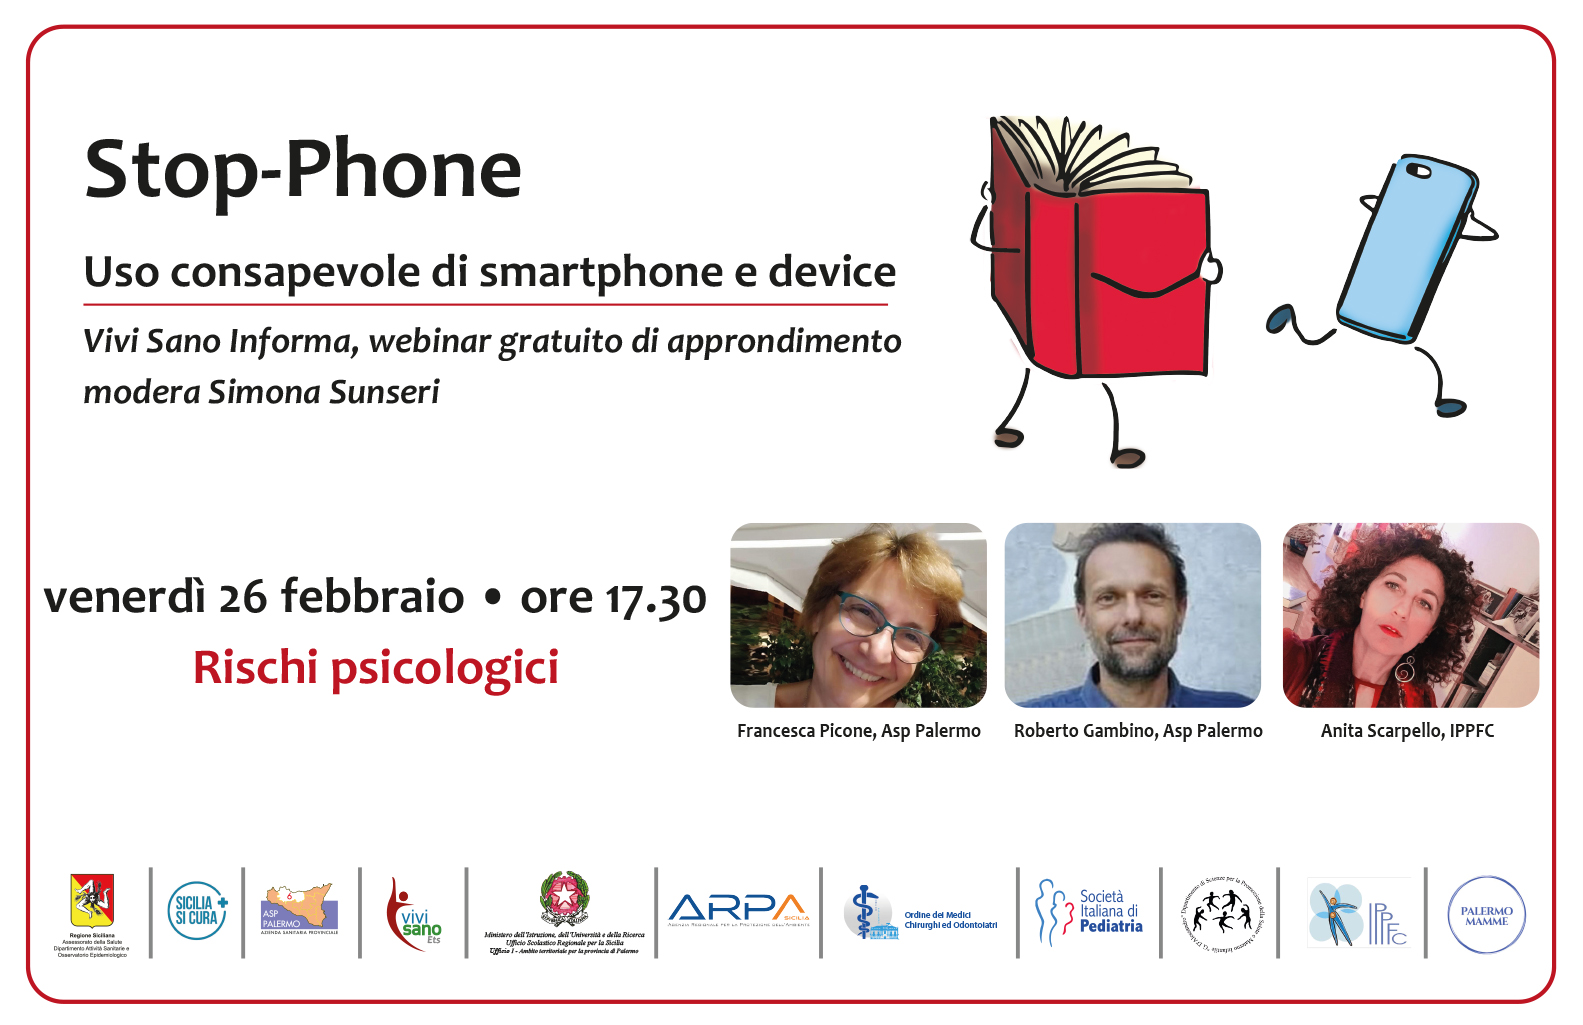 Stop-Phone, i rischi psicologici